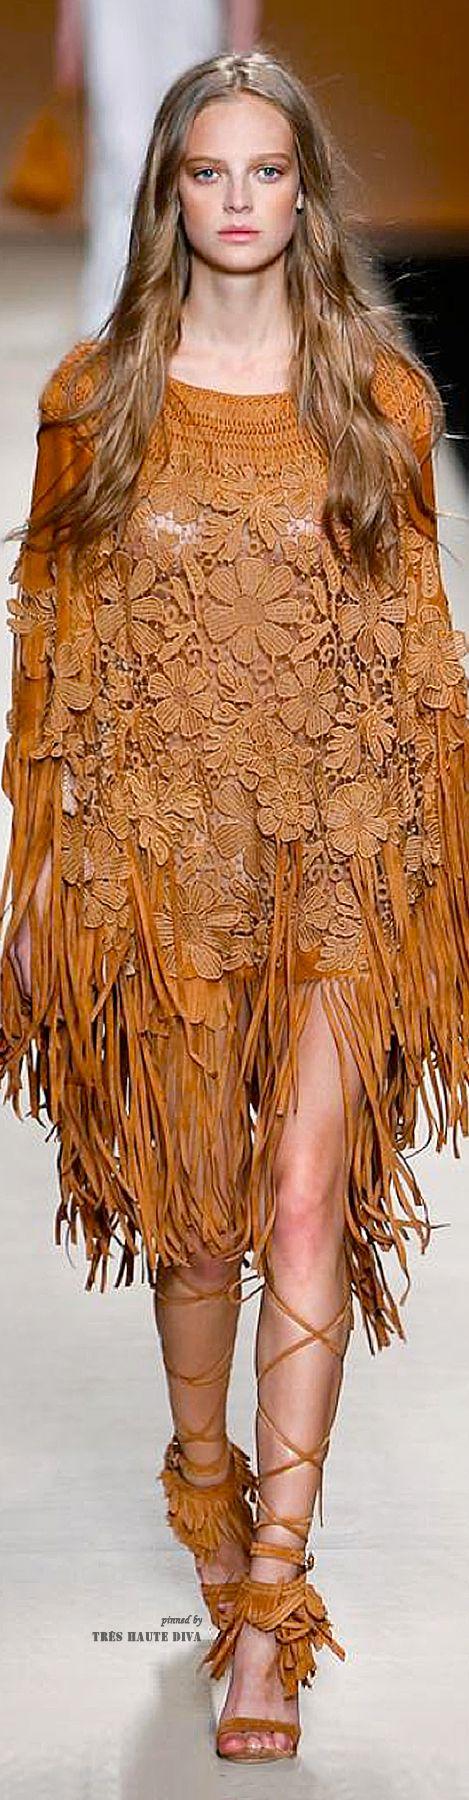 Alberta Ferretti flowers & fringe native tribal hippie bohemian fantasy fashion #UNIQUE_WOMENS_FASHION